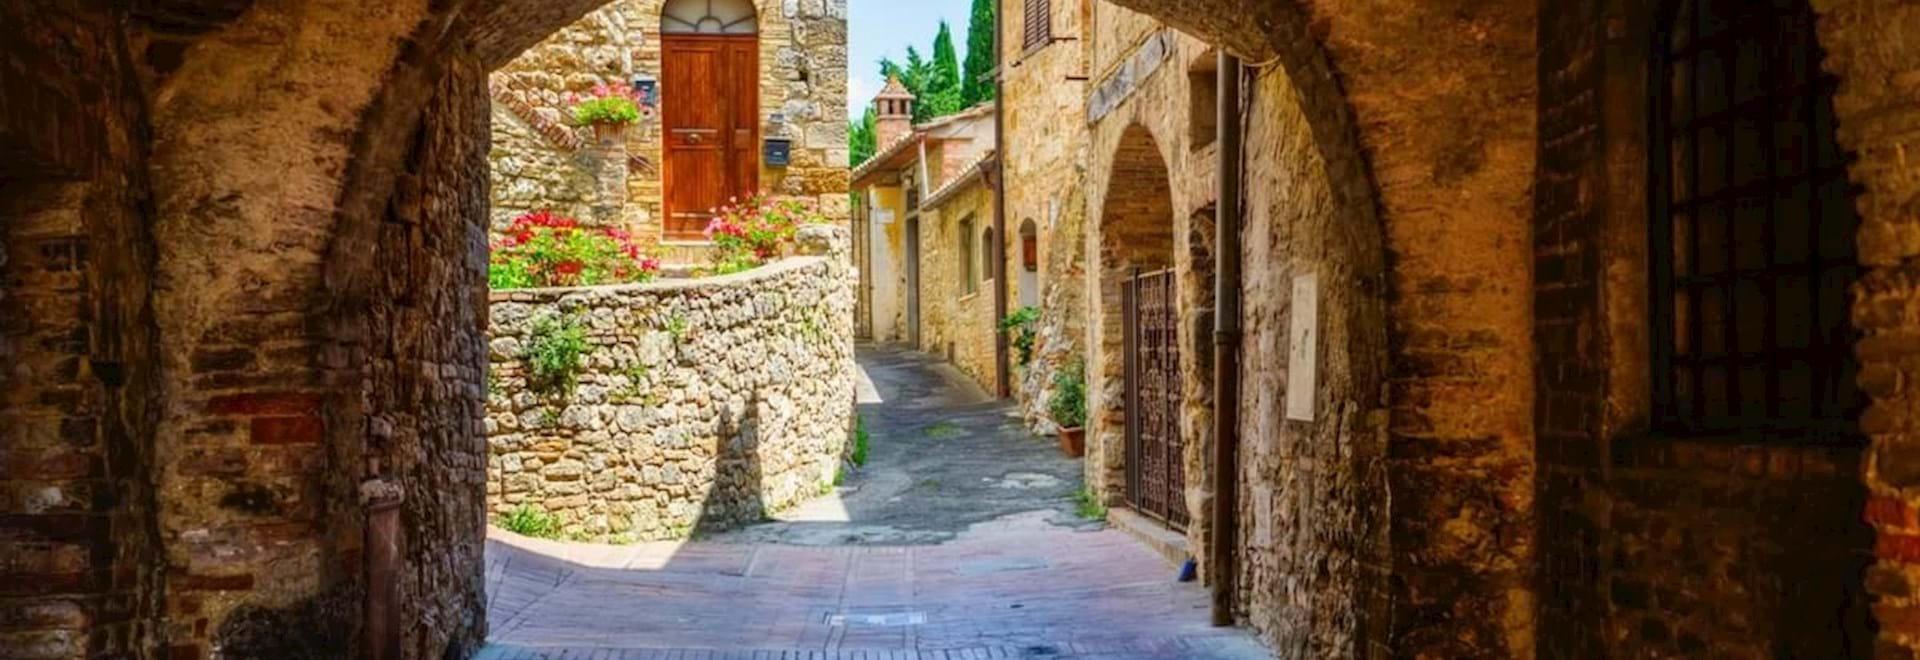 The streets of San Gimignano through an arch